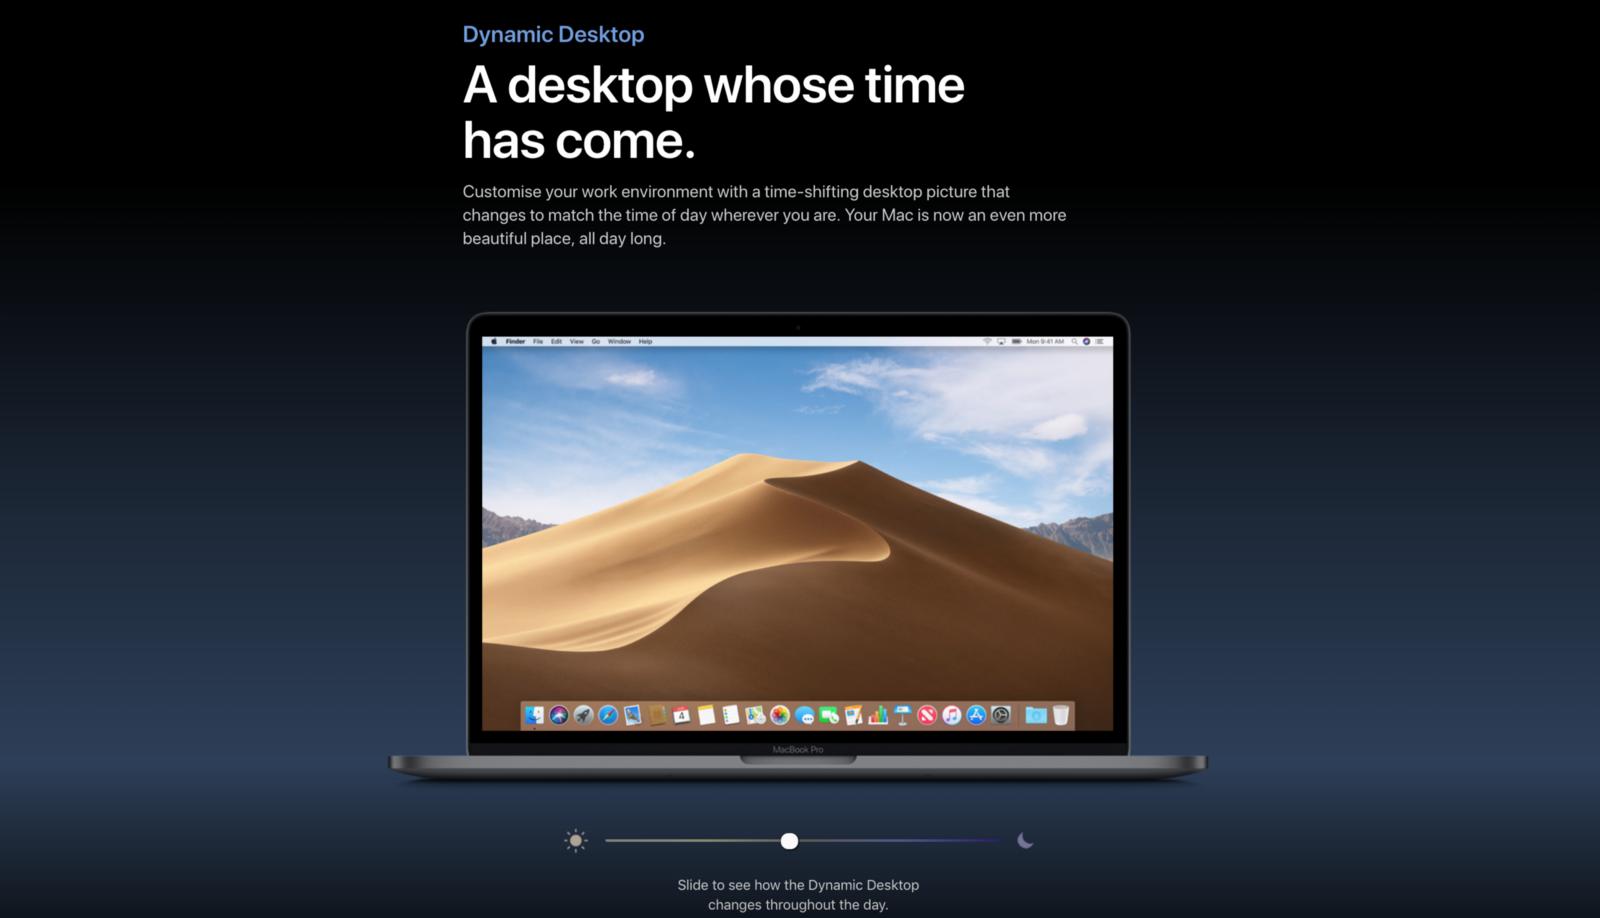 ref:  https://www.apple.com/uk/macos/mojave-preview/